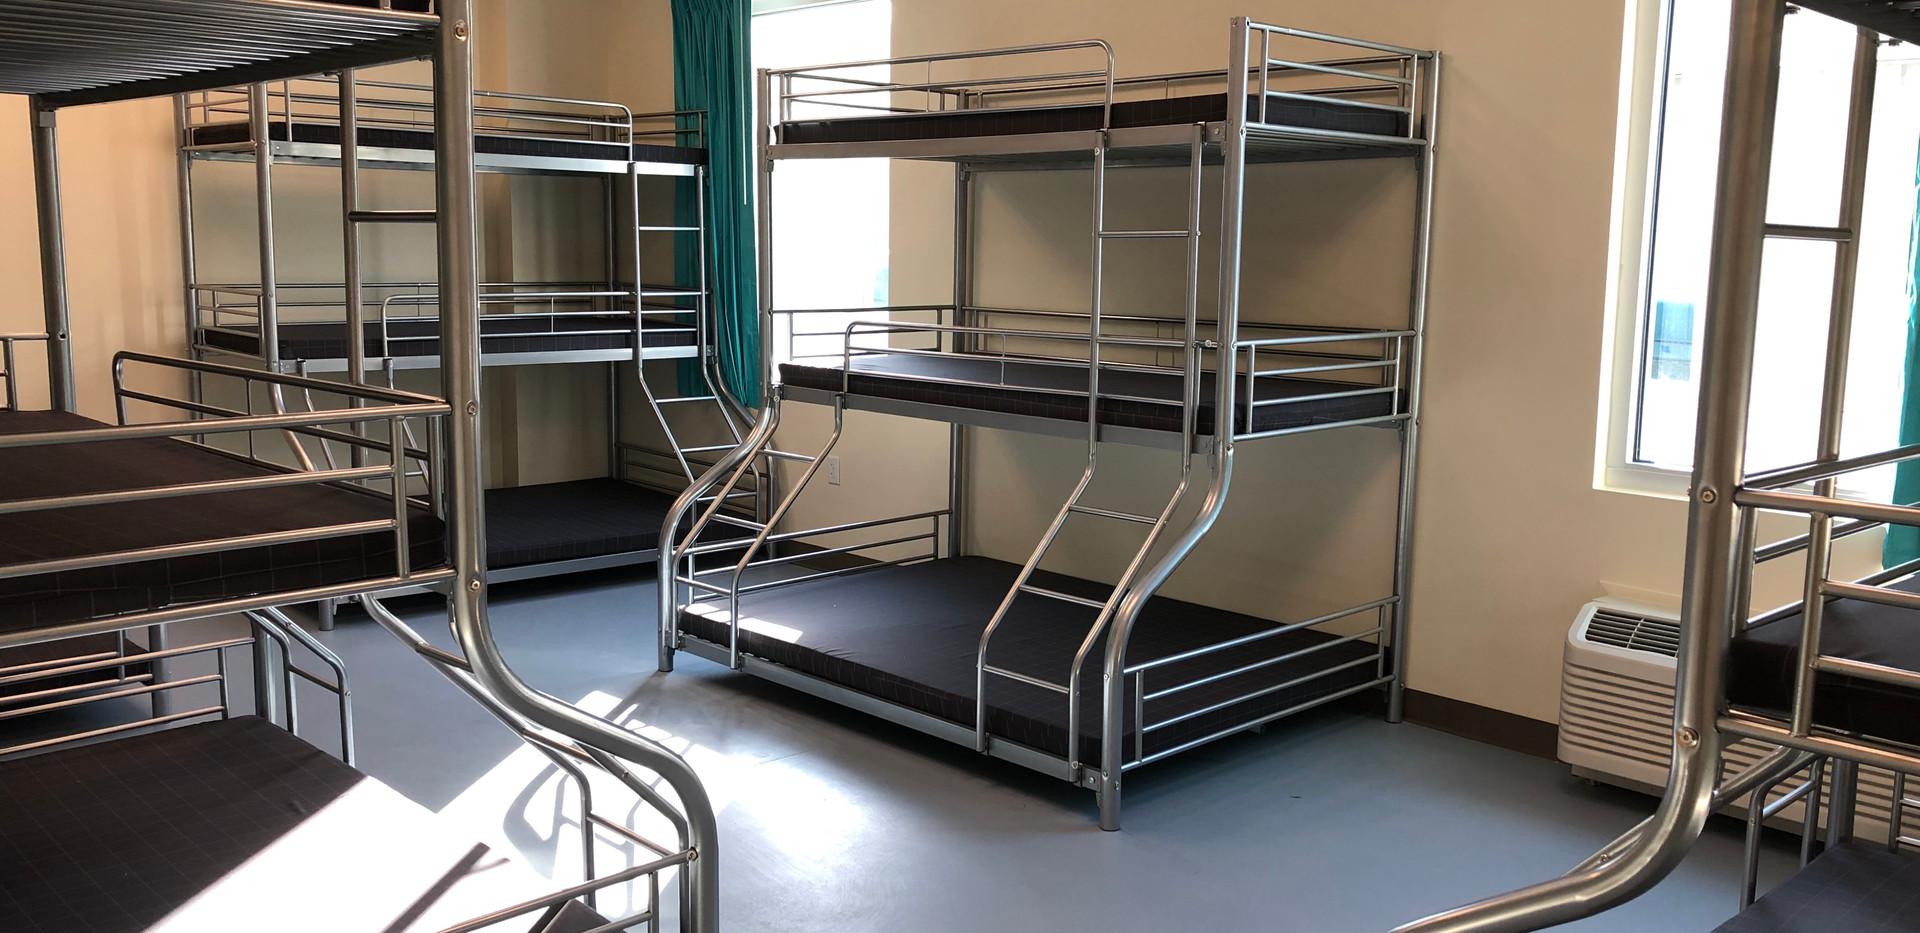 Travelodge Lodge Dorm Room